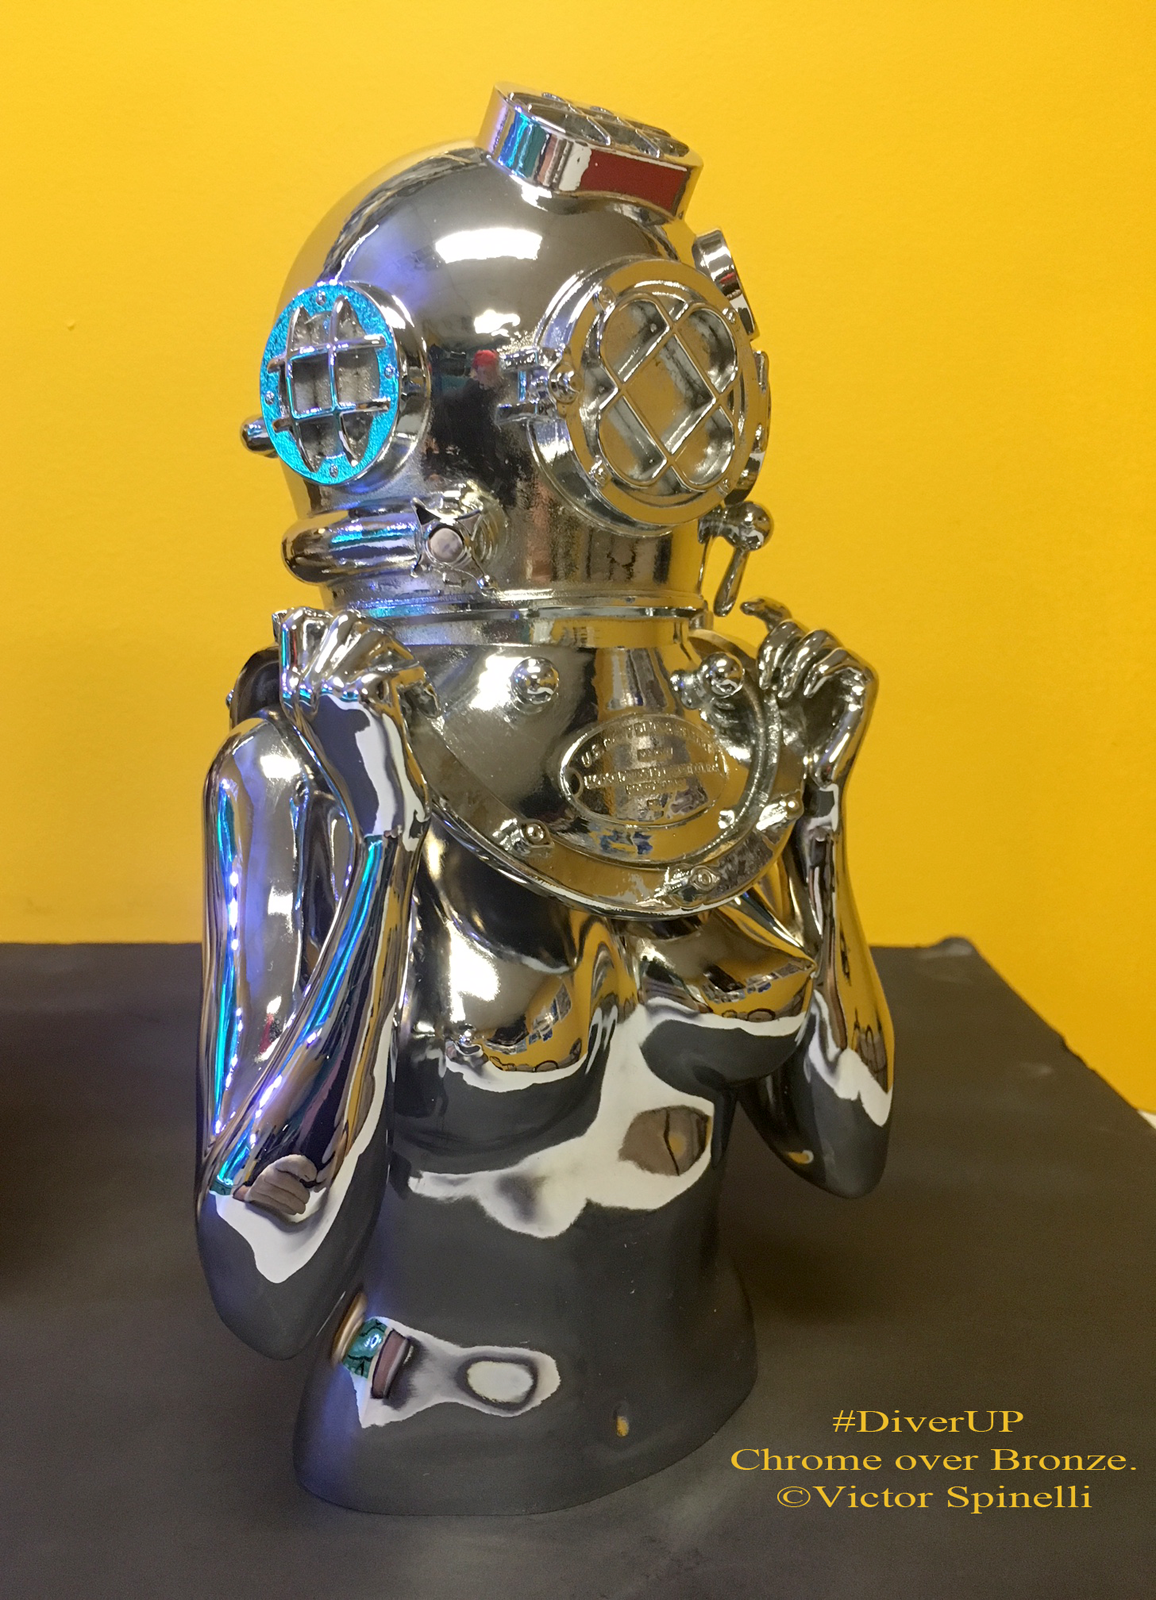 Diver UP-Bronze-Chrome-Lost wax-Victor Spinelli-Emmanuel Fremin Gallery.png